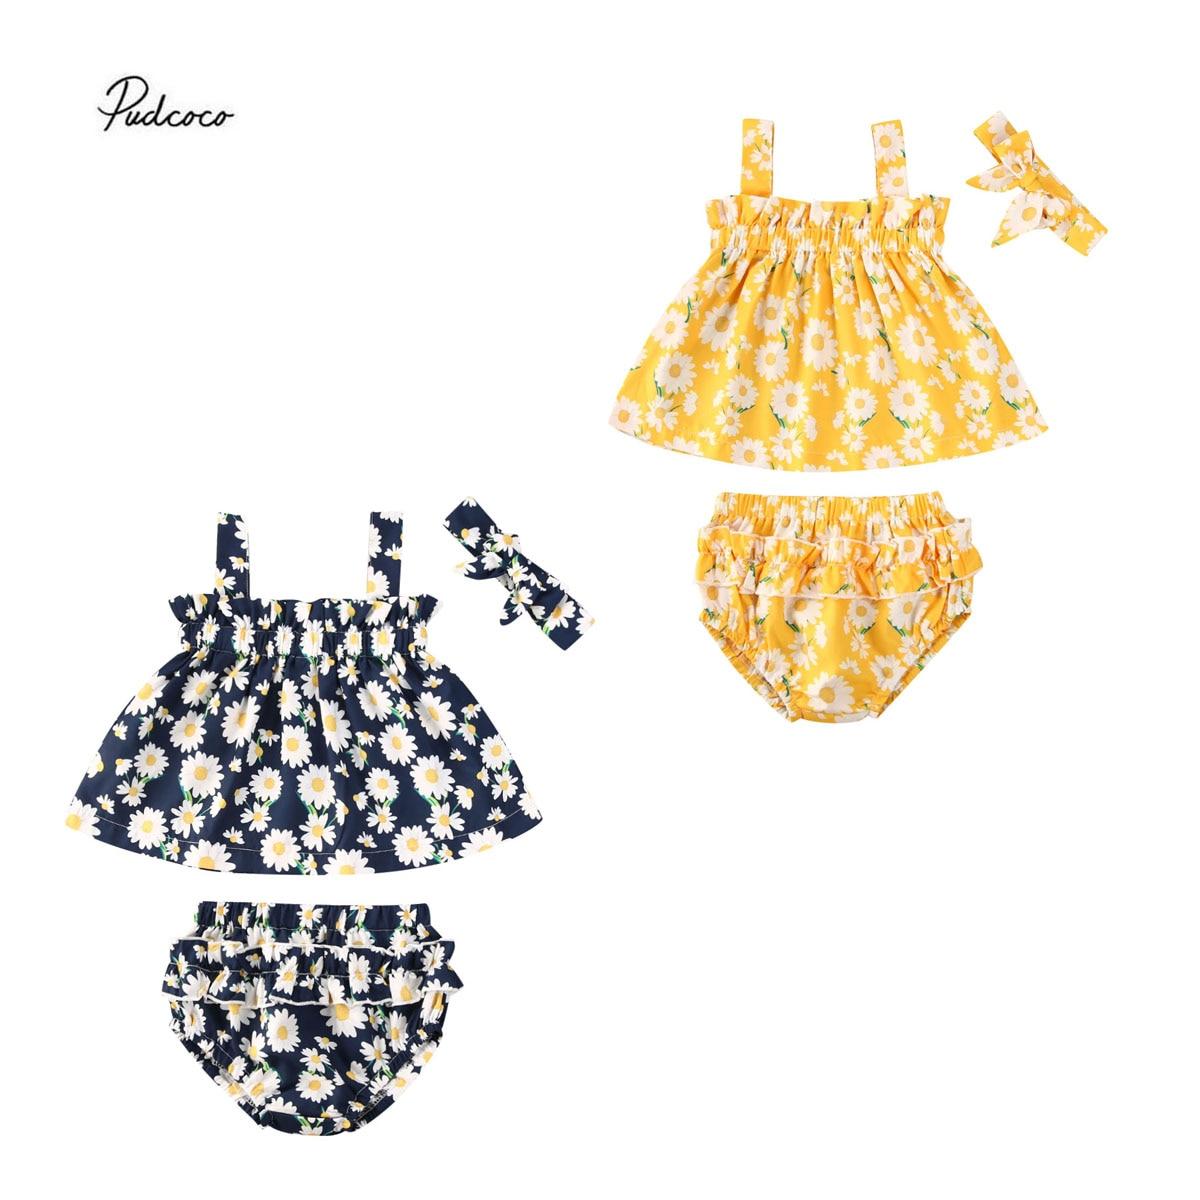 2020 Summer 0-18M Newborn Baby Girl Clothes Daisies Pirnt 2 Colors Sleeveless Top Vest+Ruffle Short Pants Set Floral Summer 2pcs